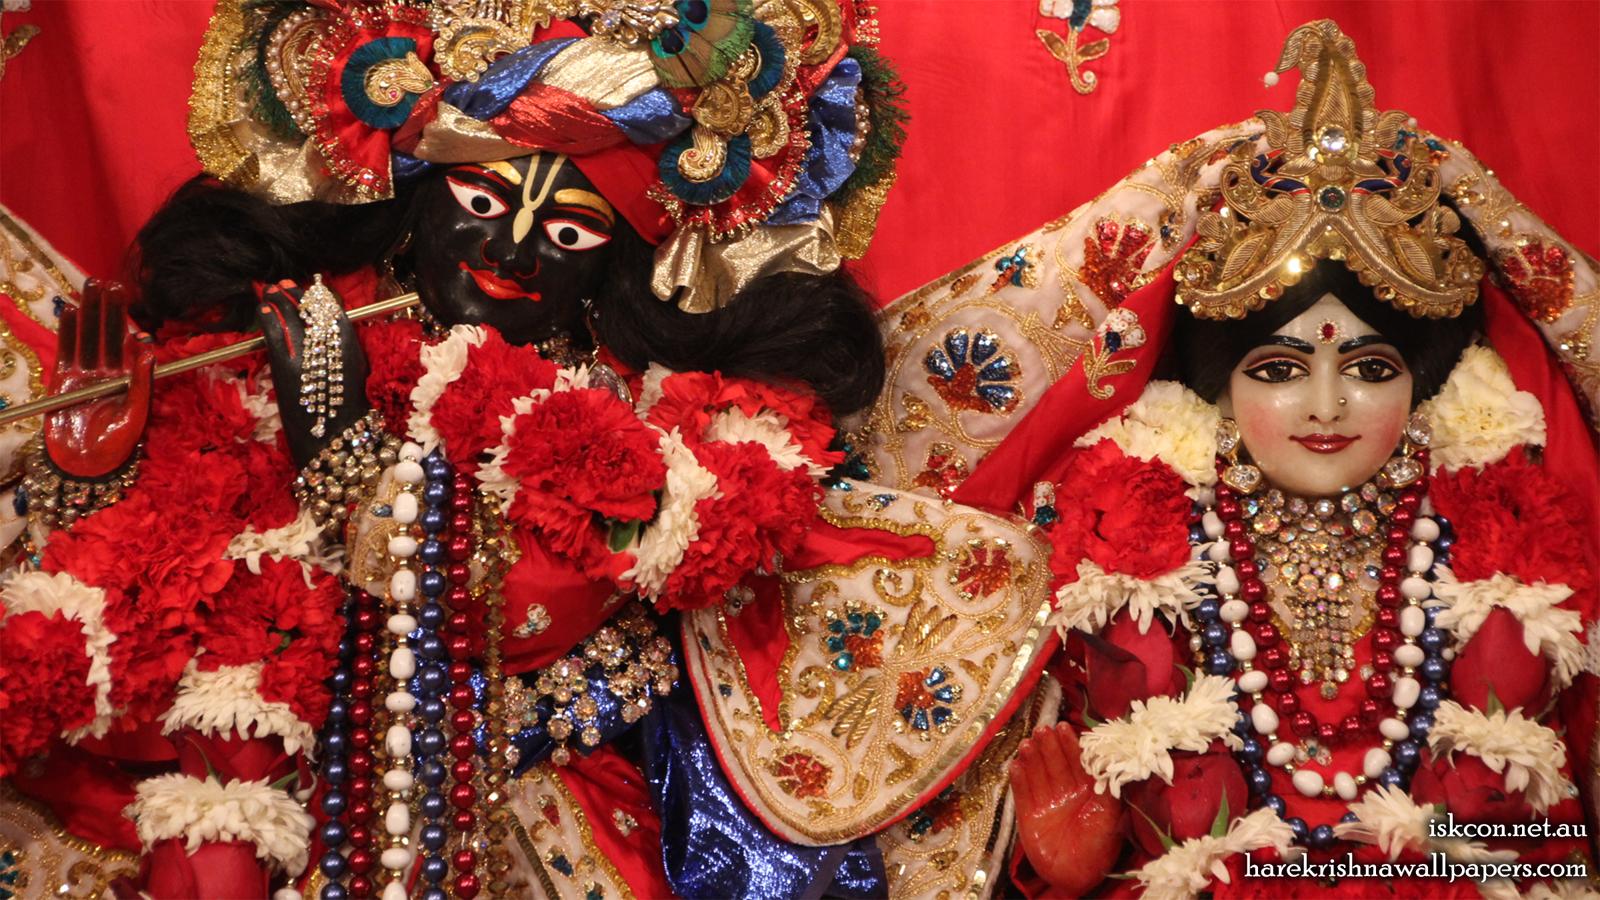 Sri Sri Radha Vallabh Close up Wallpaper (007) Size 1600x900 Download